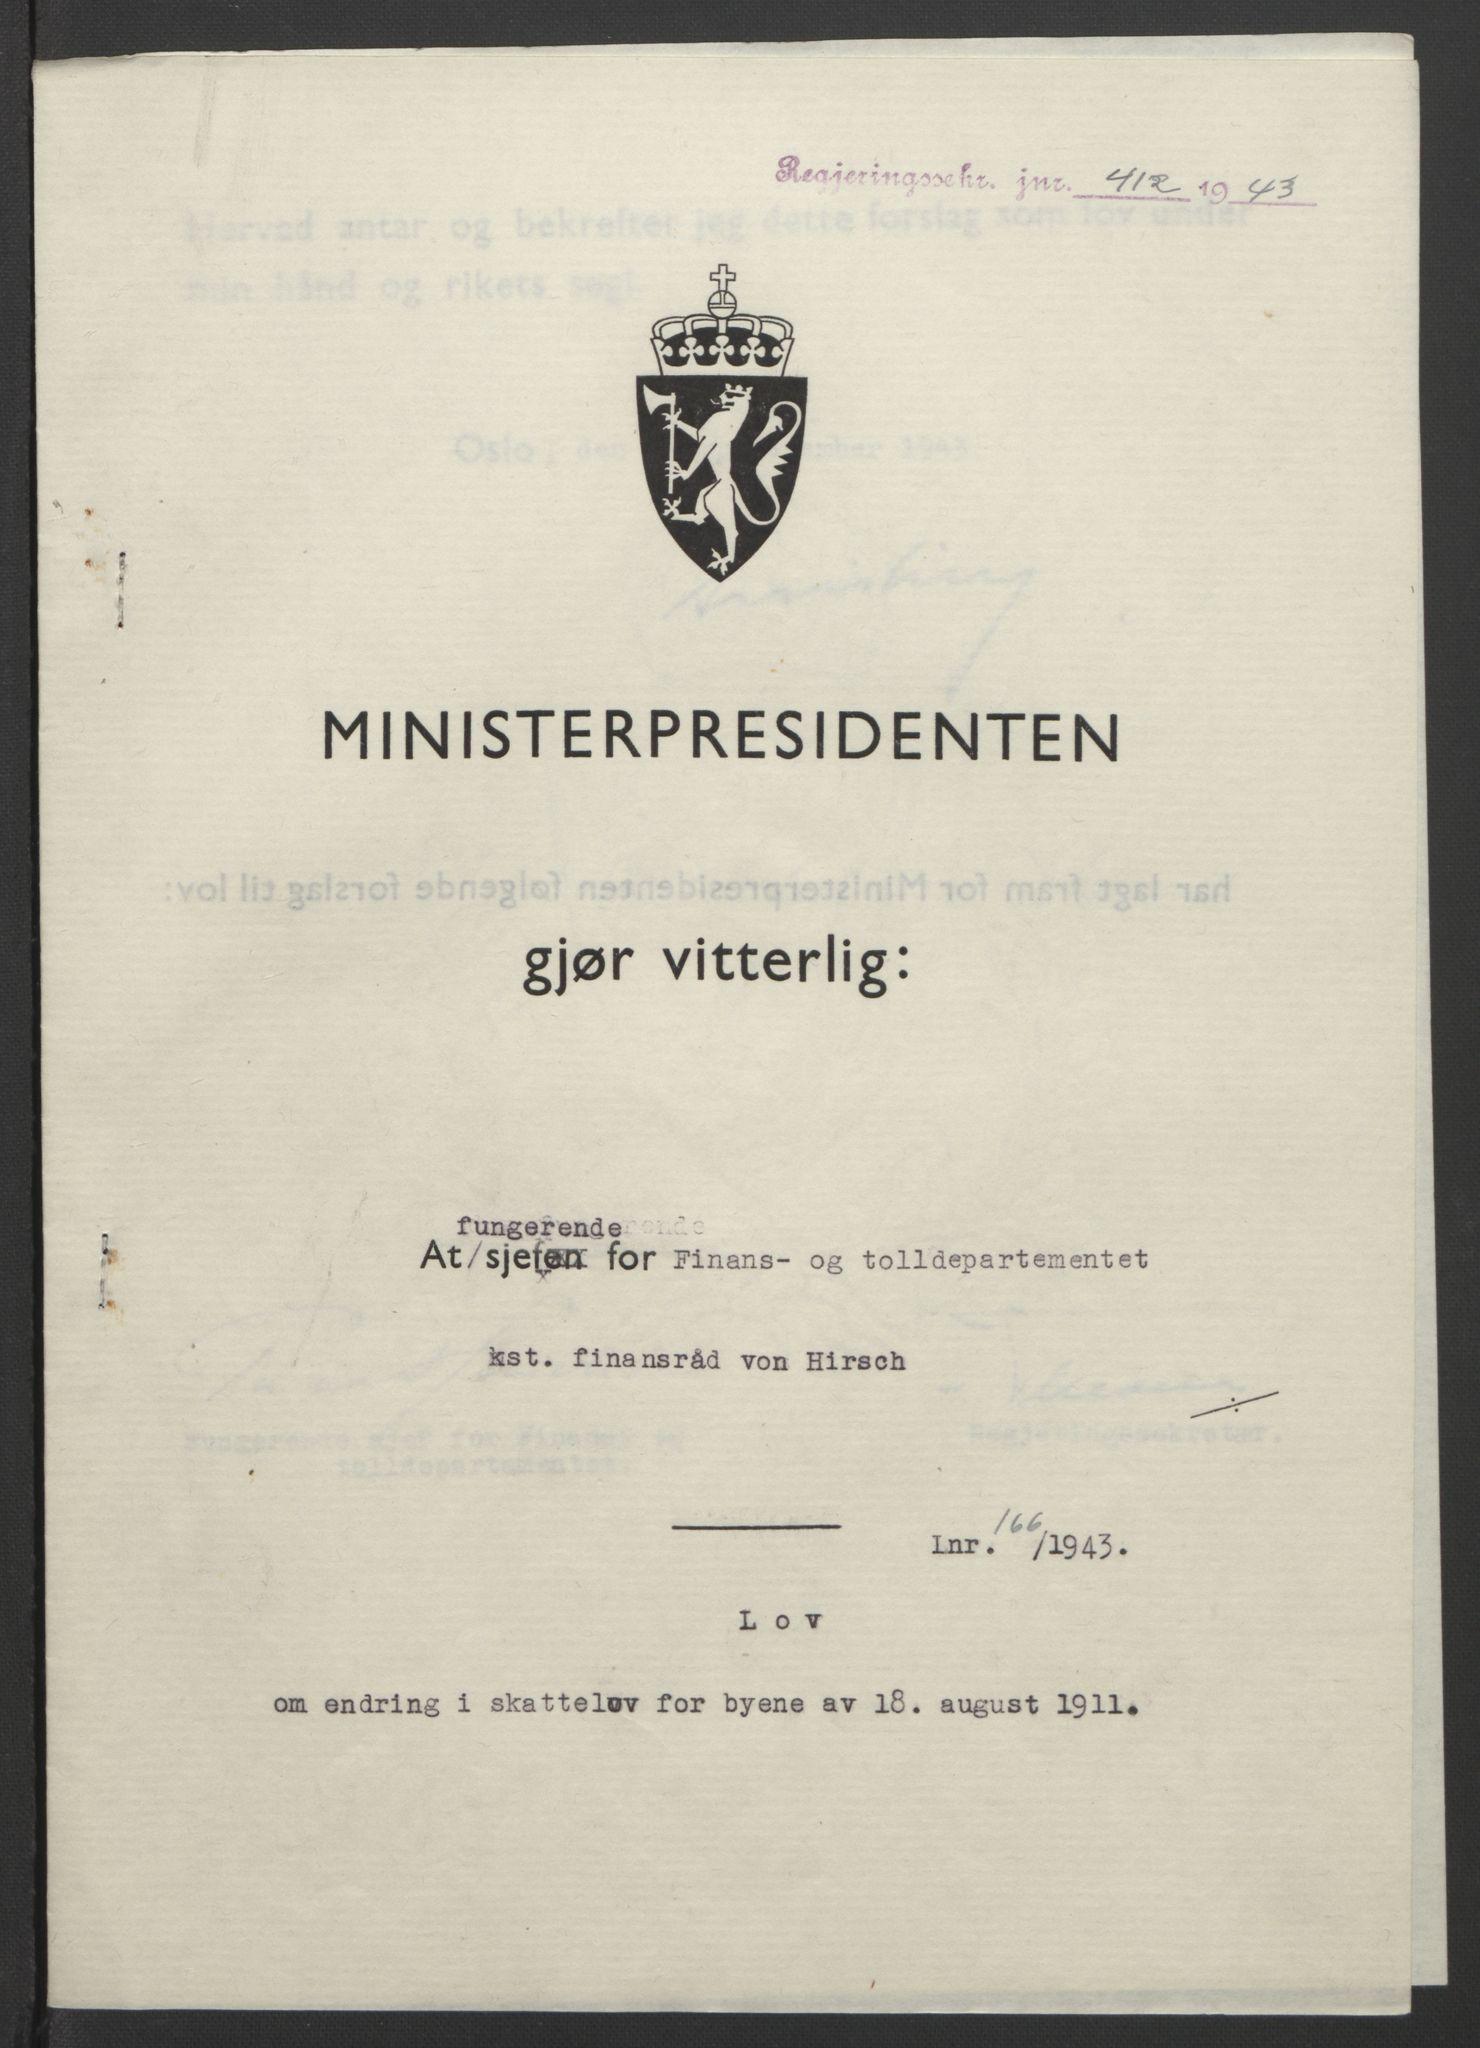 RA, NS-administrasjonen 1940-1945 (Statsrådsekretariatet, de kommisariske statsråder mm), D/Db/L0099: Lover, 1943, s. 783